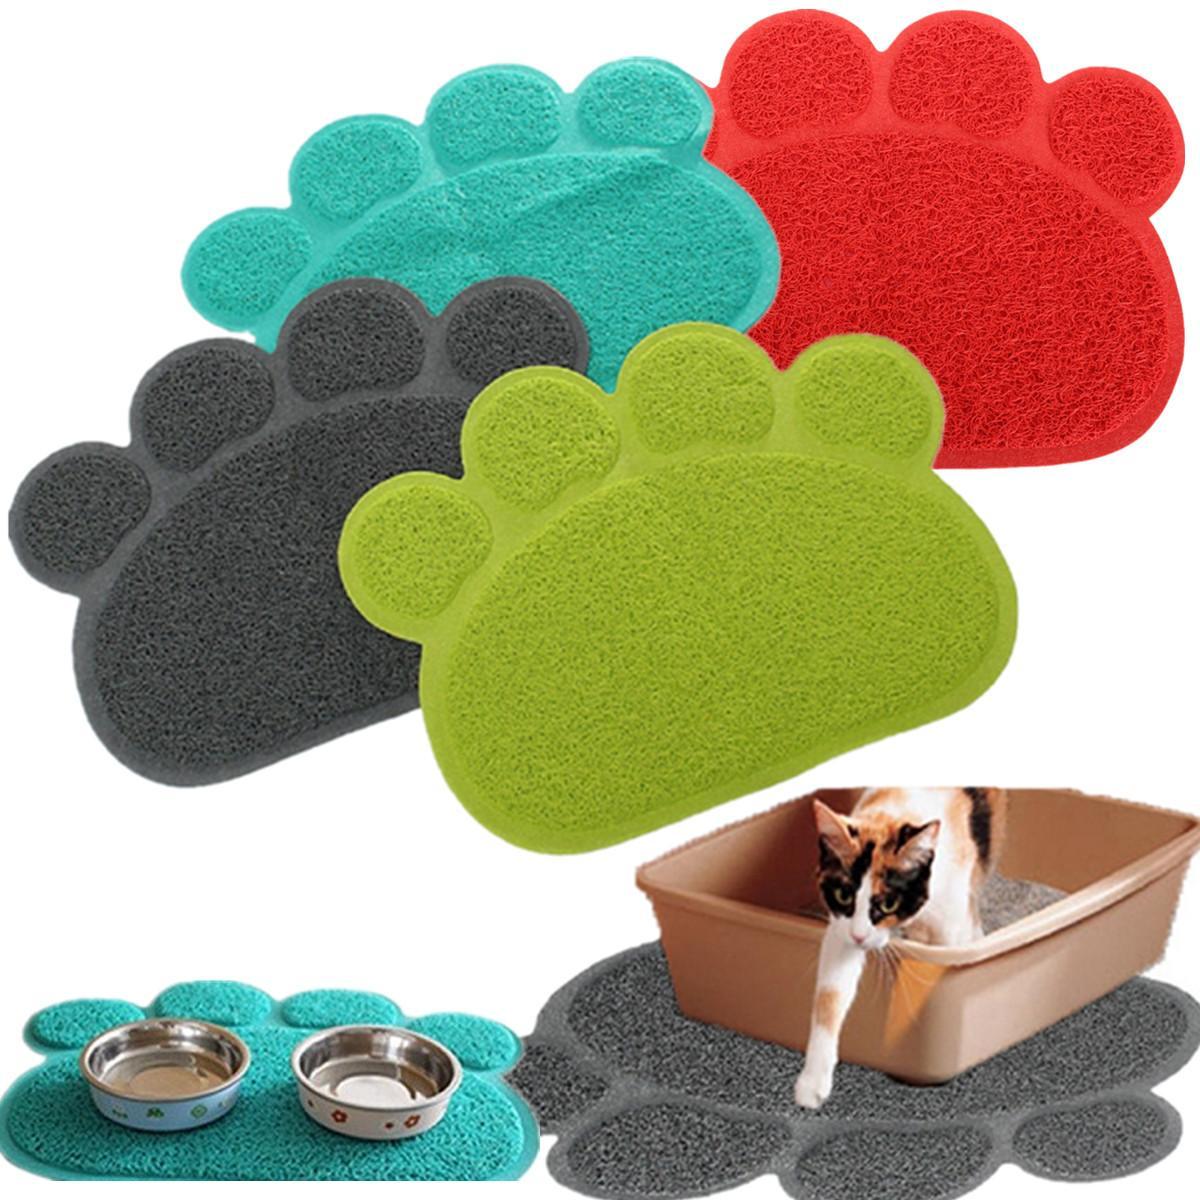 Multicolor PVC Paw Print Pad Dog Cat Litter Mat Pet Puppy Dish Feeding Bowl Placemat Anti-skid Waterproof Sleeping Placemat